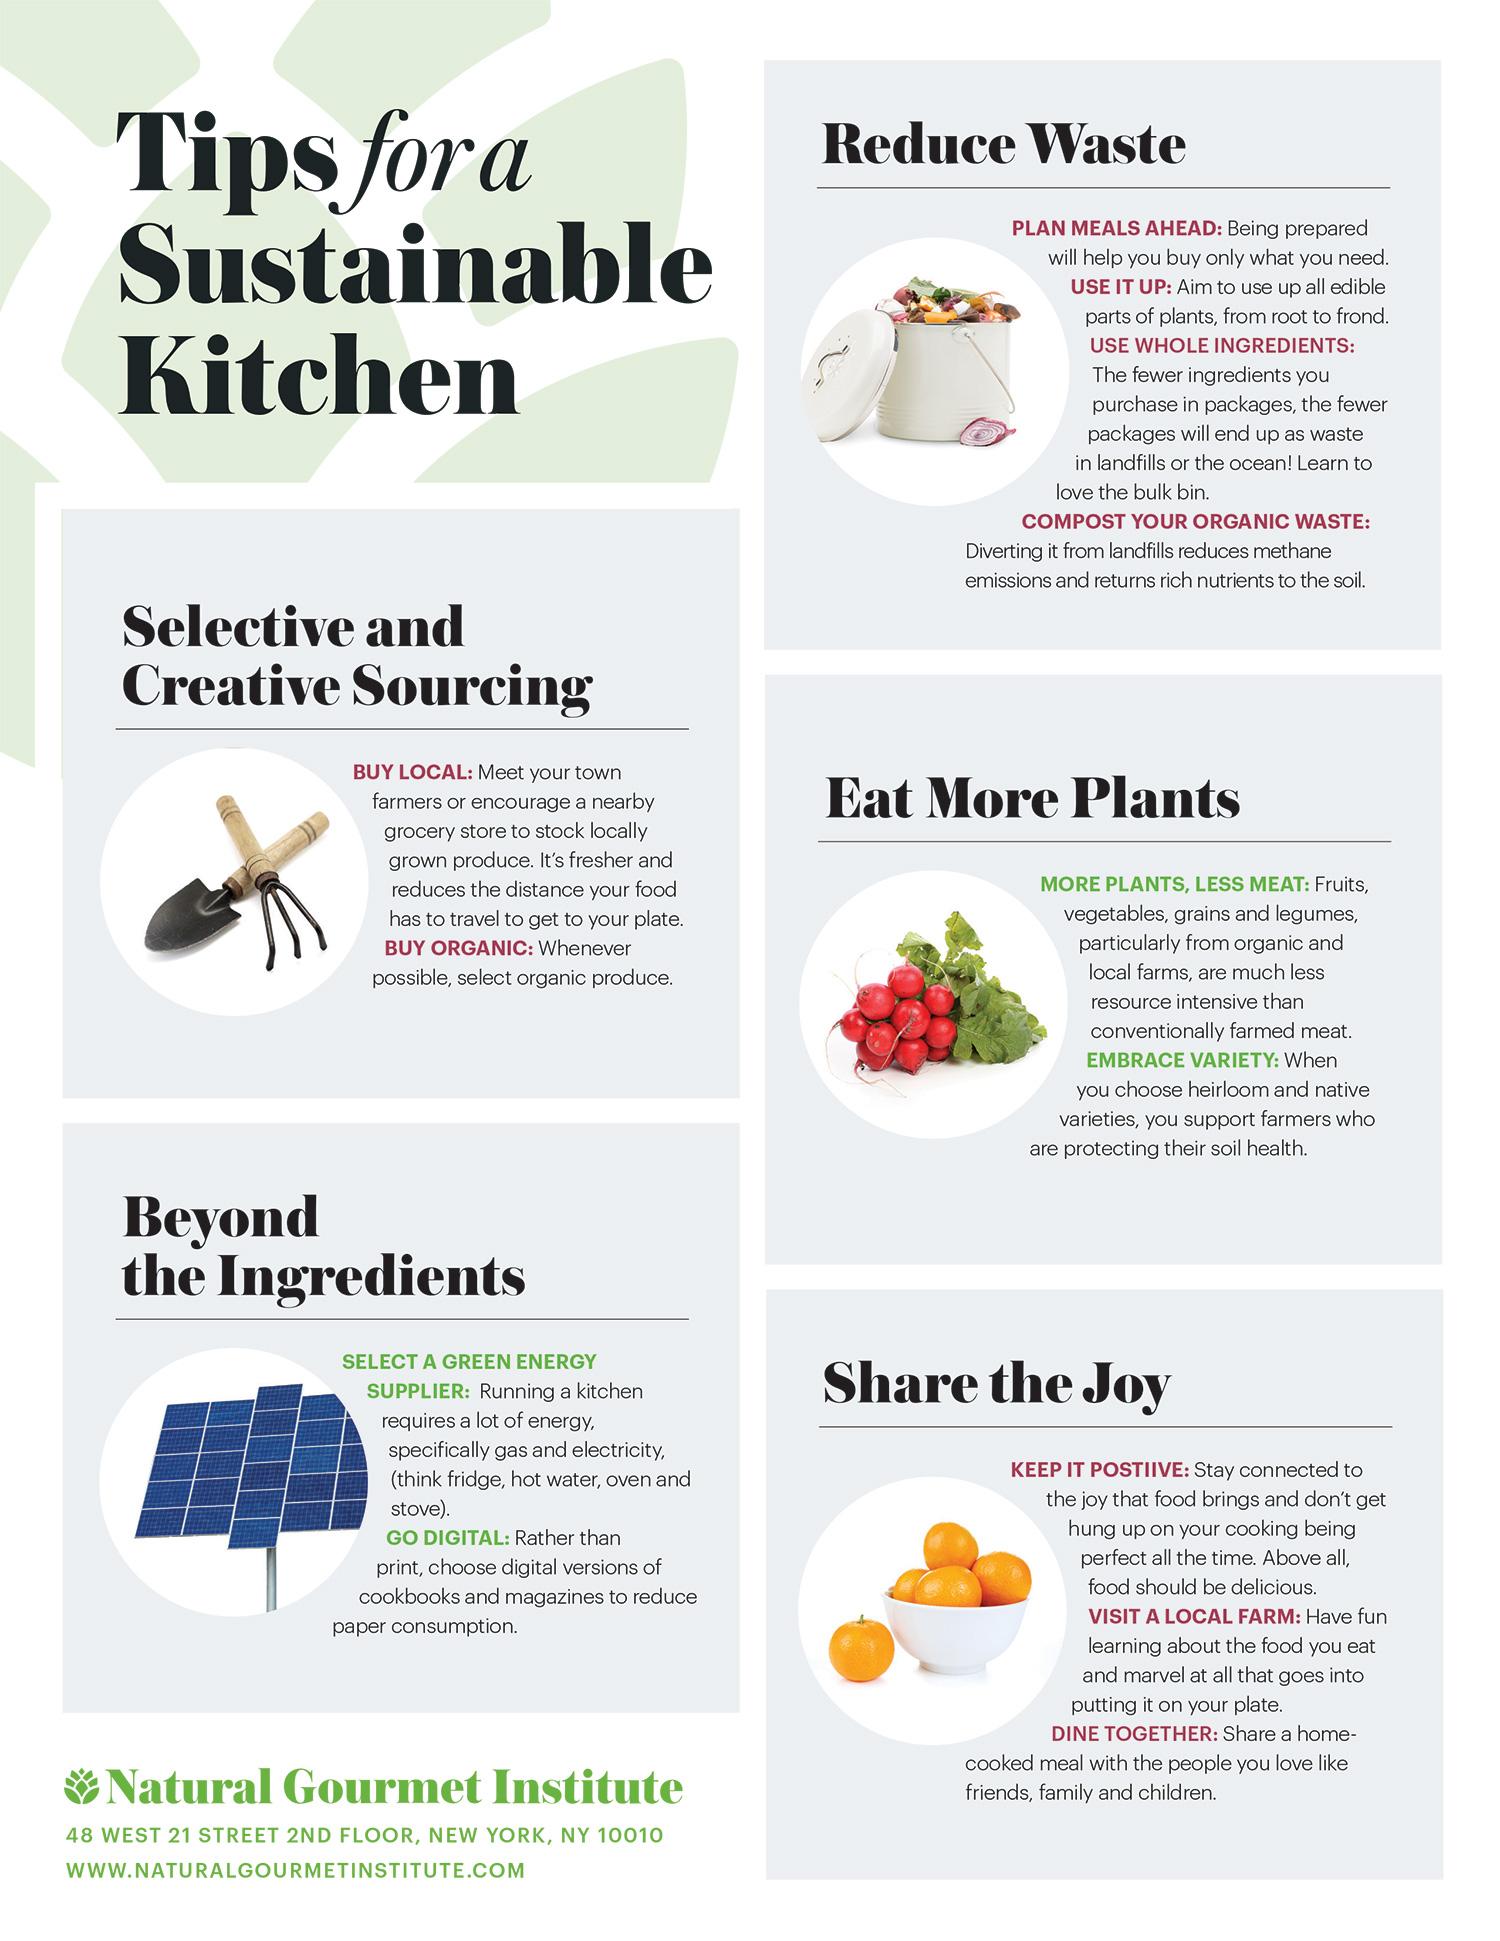 NGI-infographic1.jpg